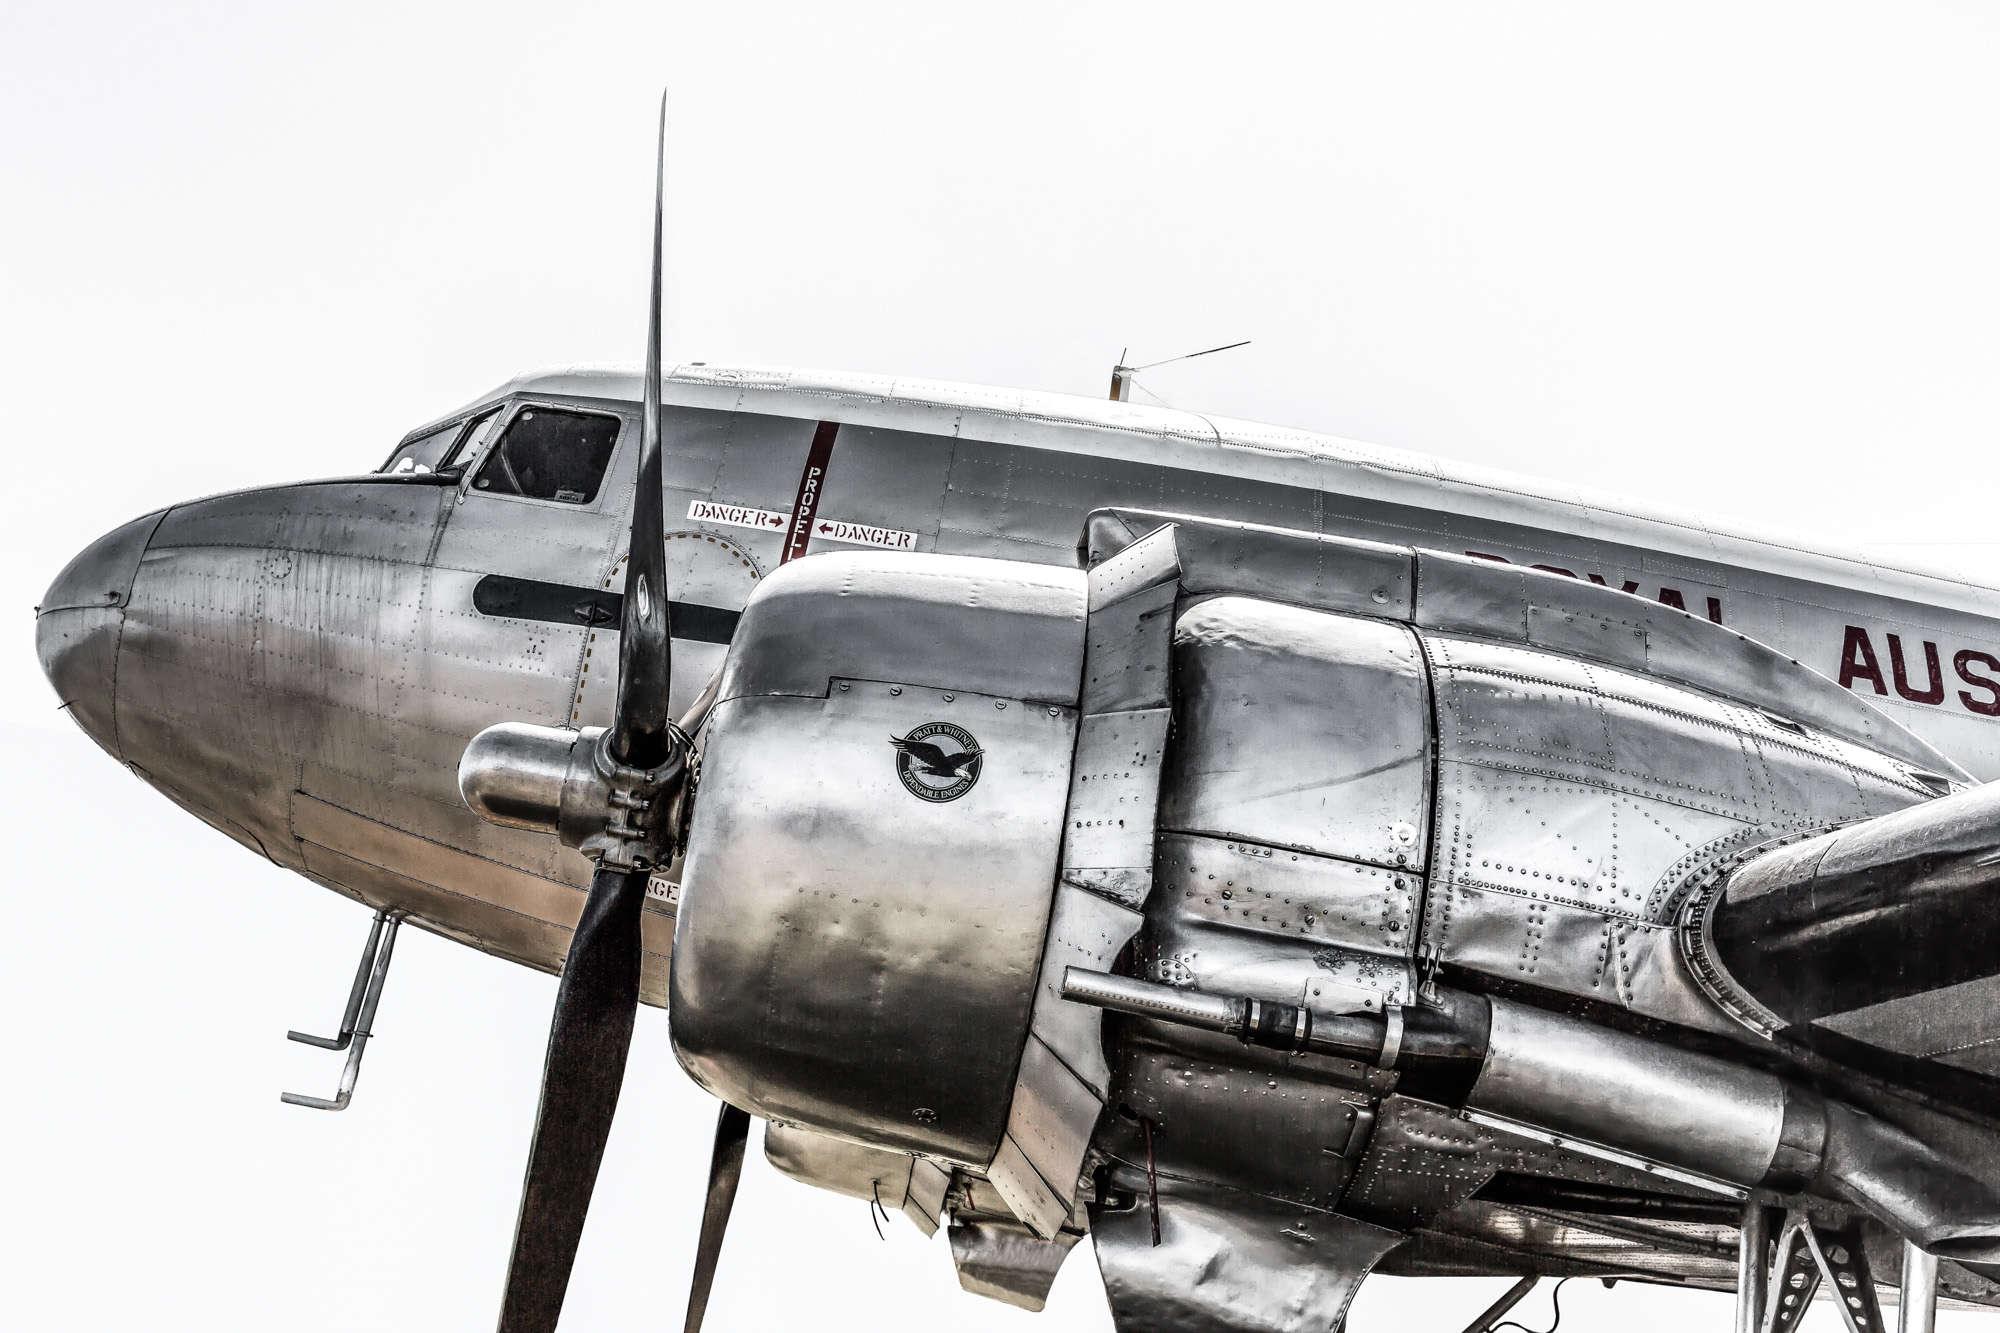 Gary Sheppard - Douglas C-47 Skytrain